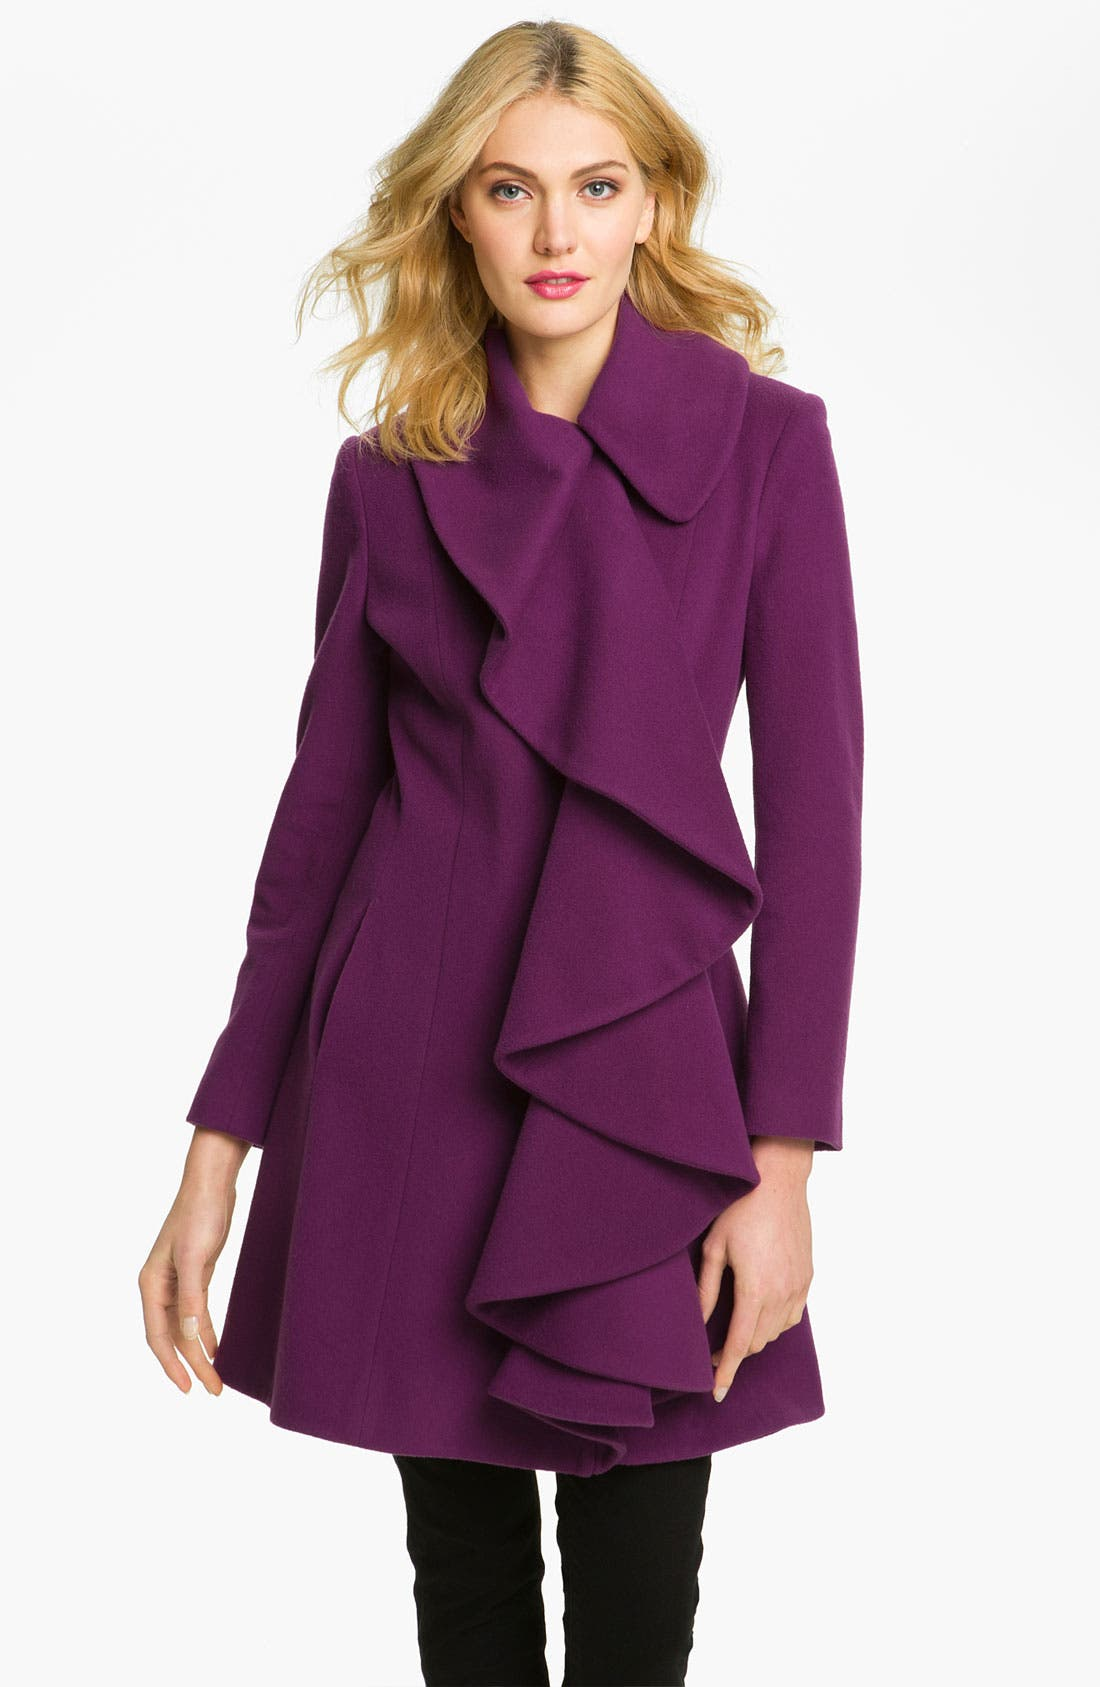 Alternate Image 1 Selected - Helene Berman Ruffle Front Coat